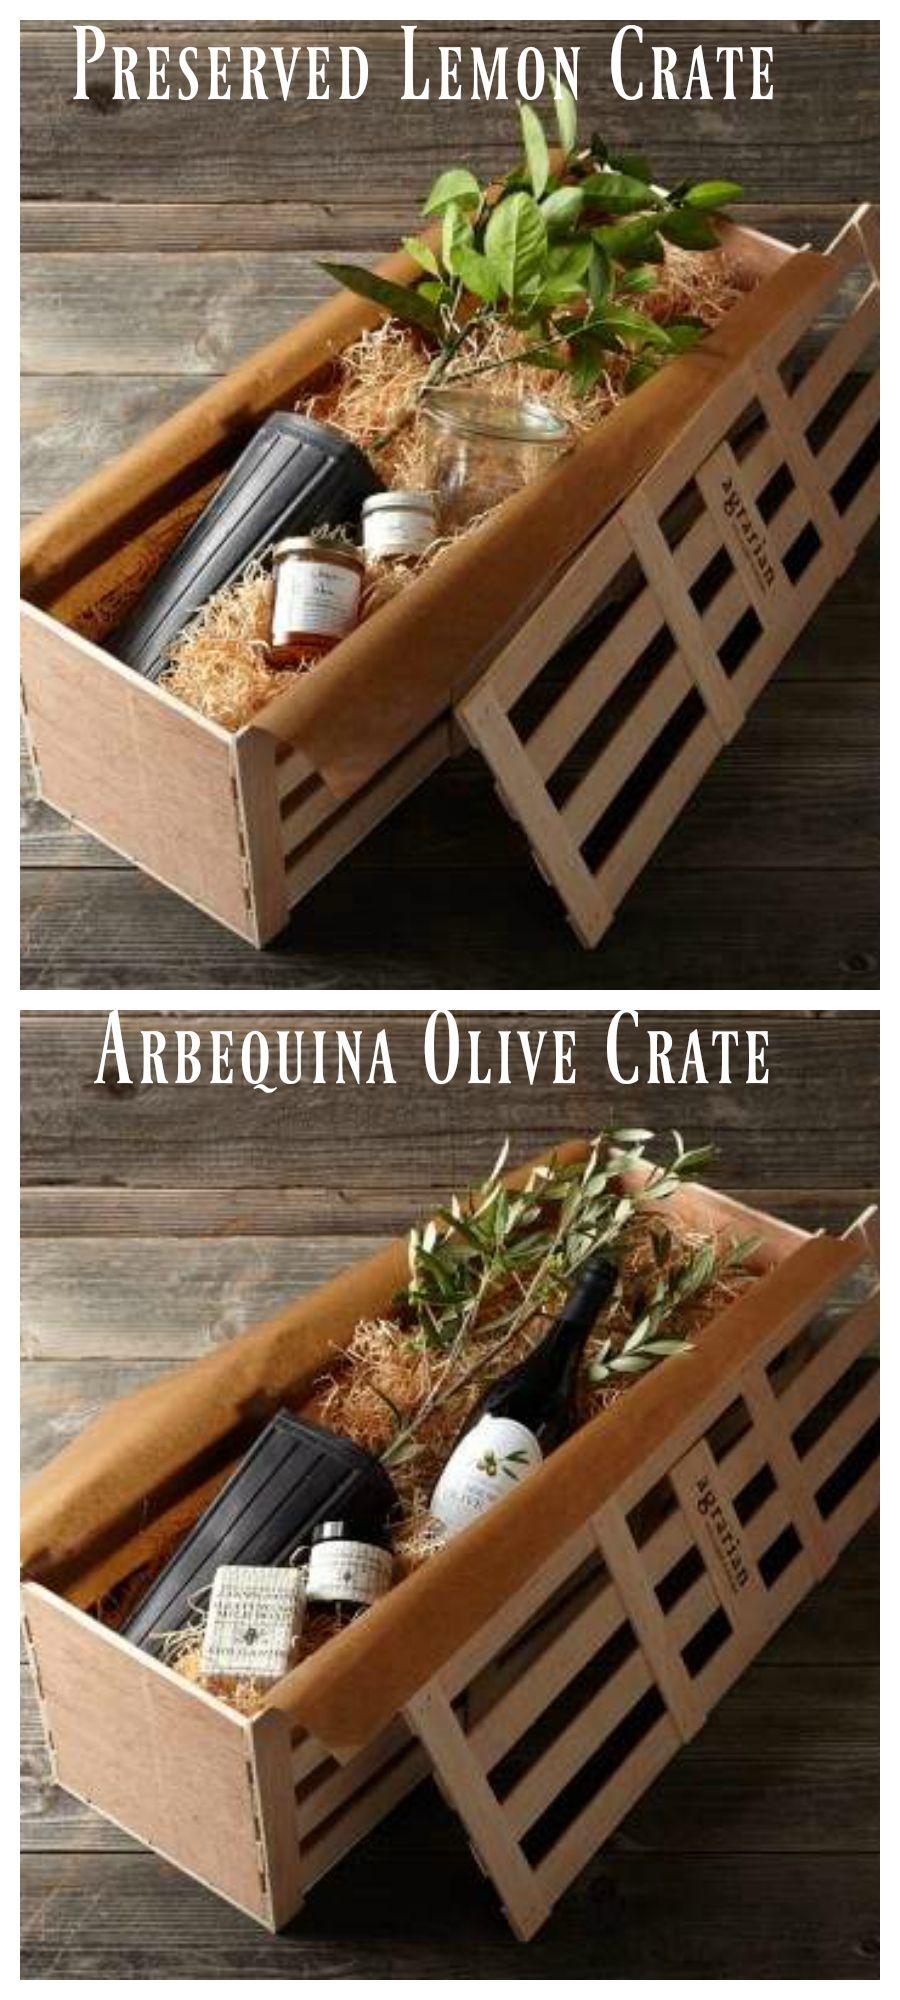 Williams Sonoma Gift Crates Gardening Ideas Basket Tree